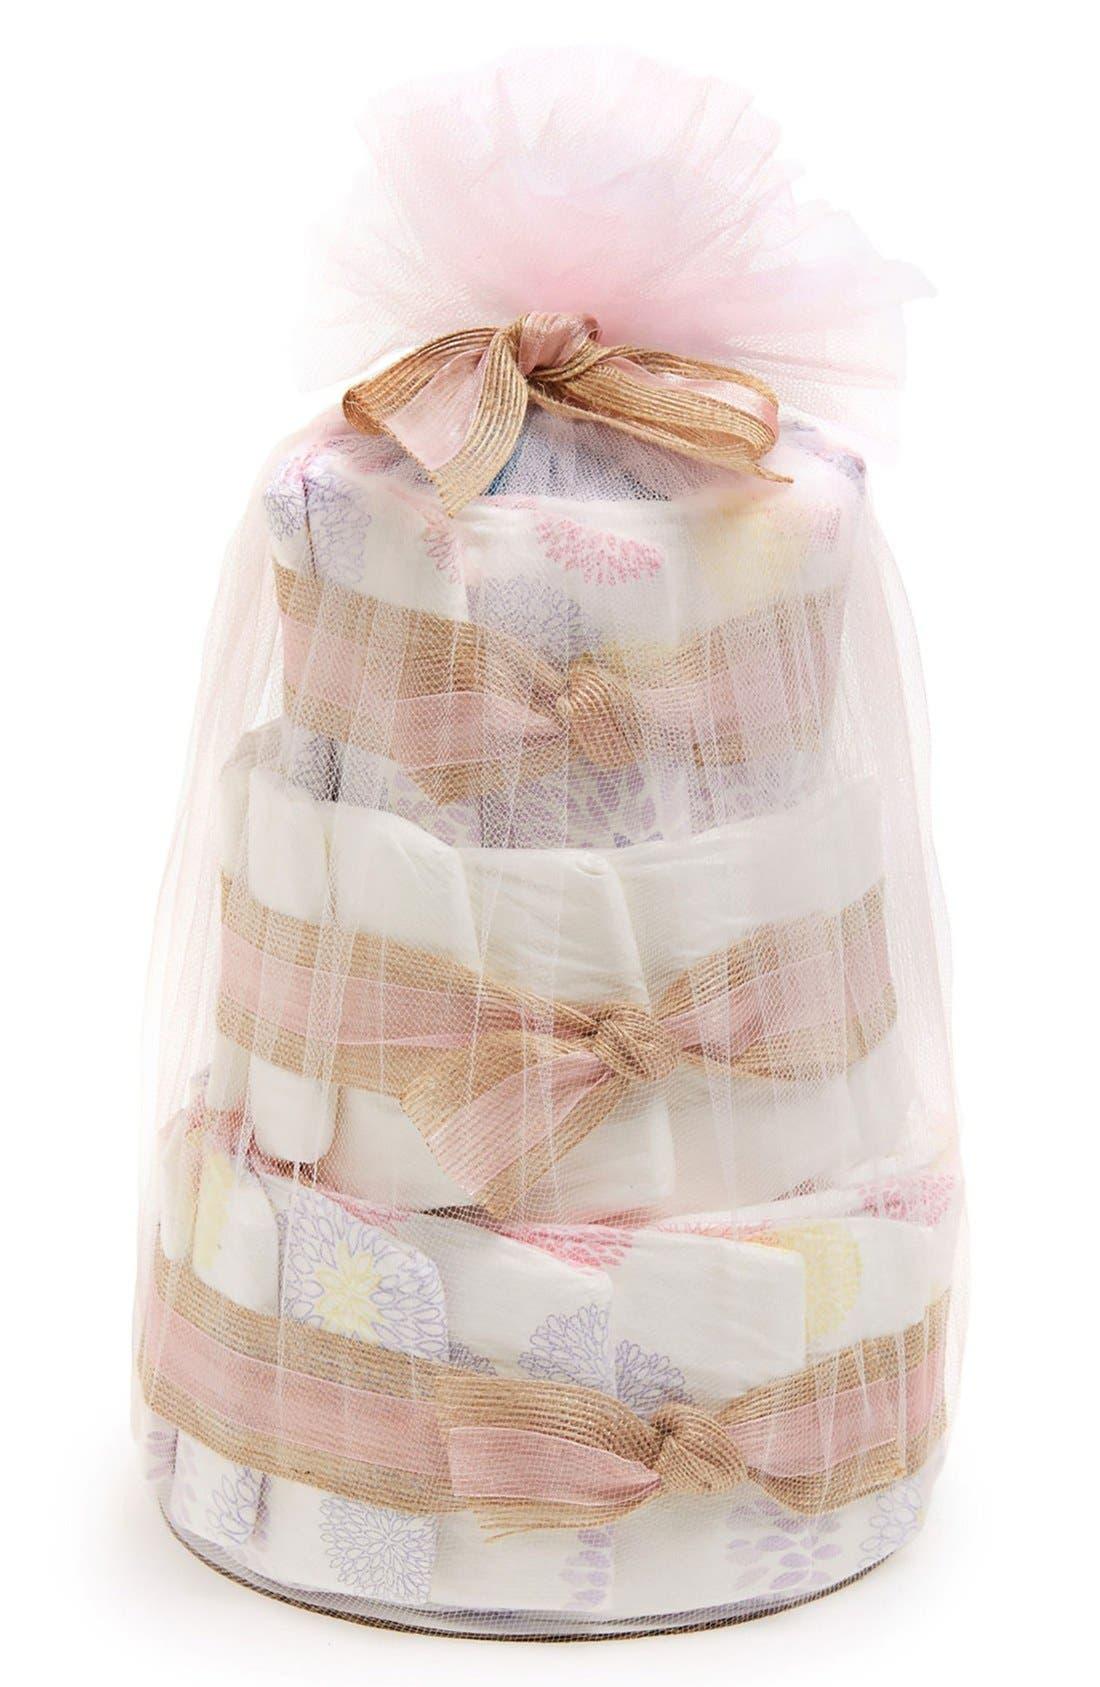 Mini Diaper Cake & Travel-Size Essentials Set,                             Main thumbnail 7, color,